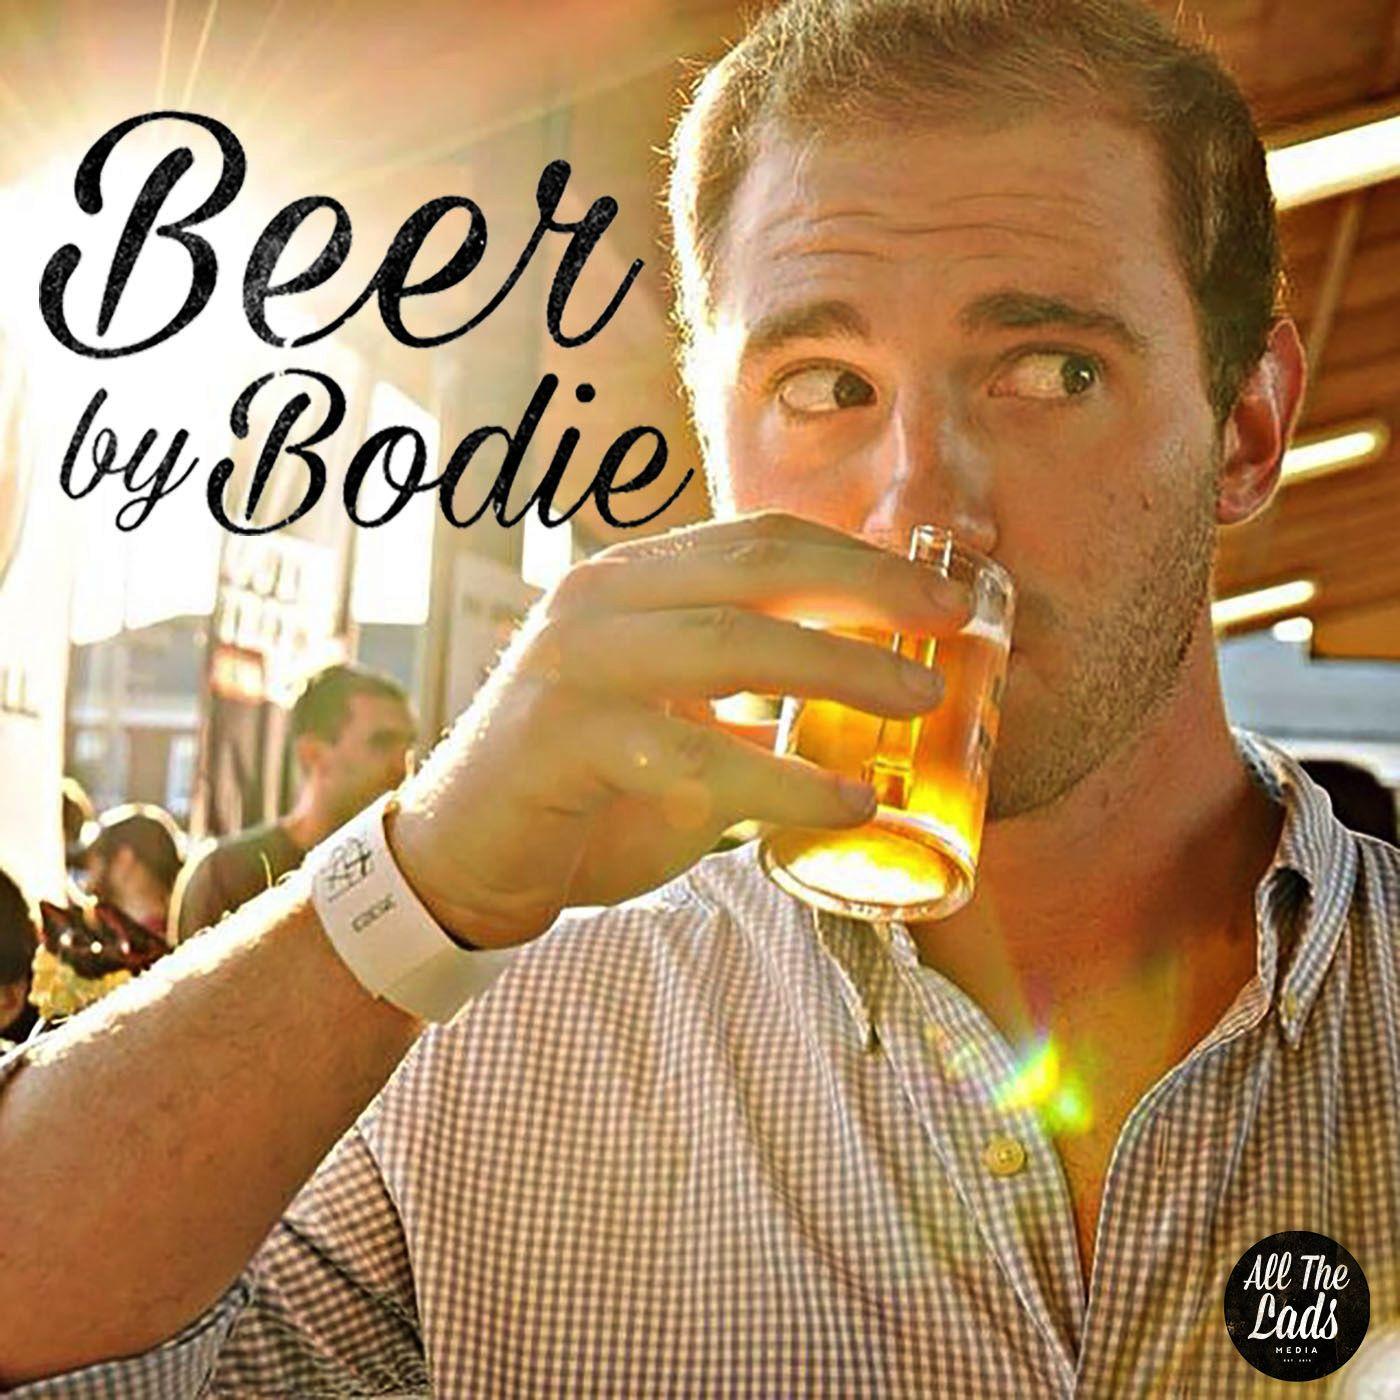 Beer by Bodie